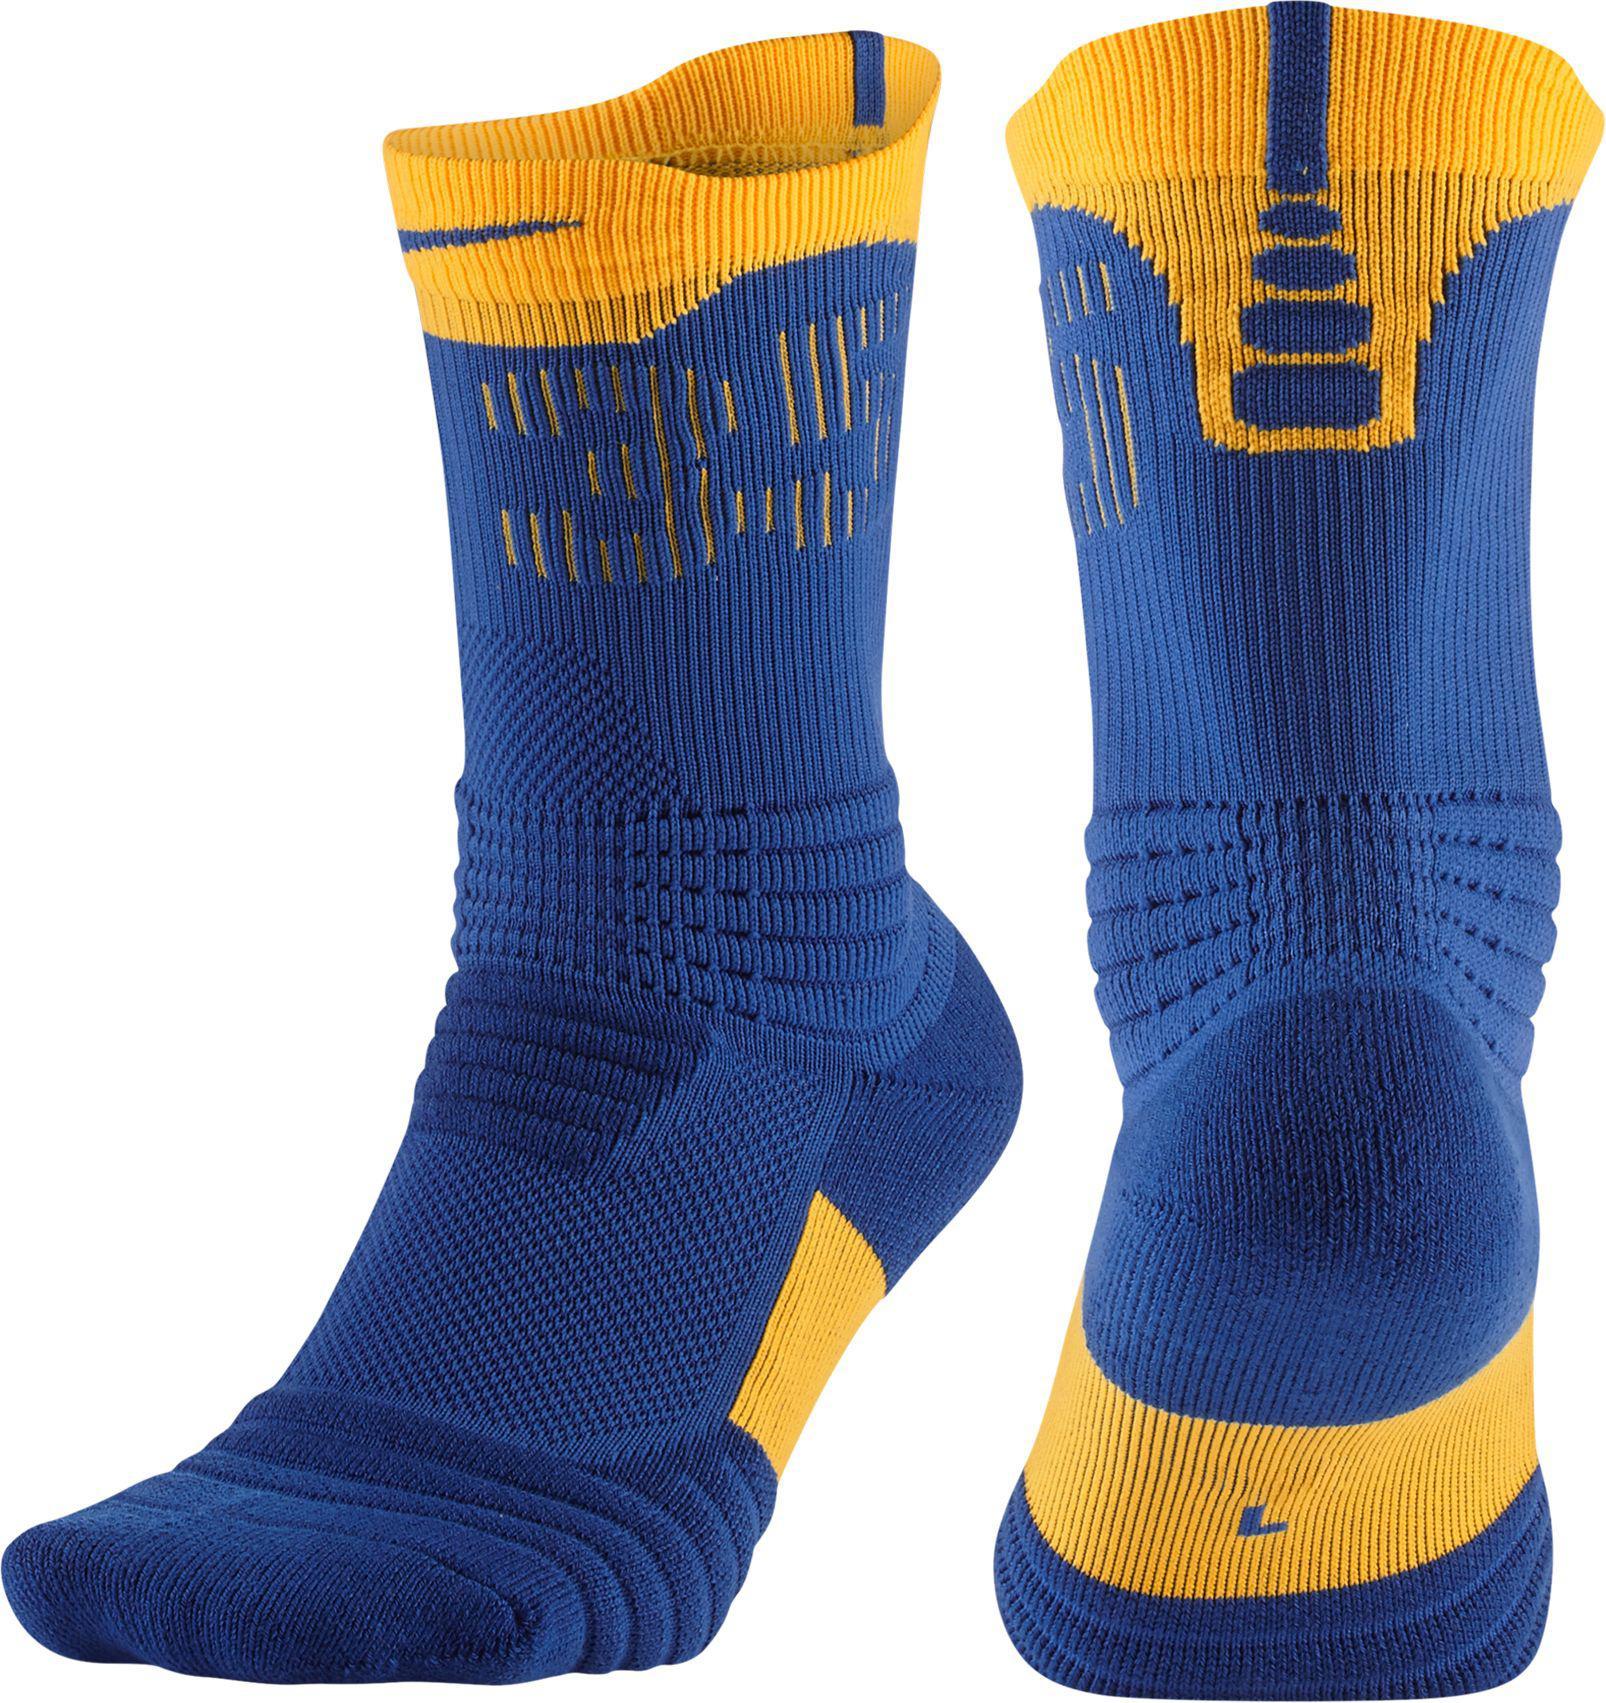 fe908ee4d5d Nike Kd Versatility Crew Socks in Blue for Men - Lyst